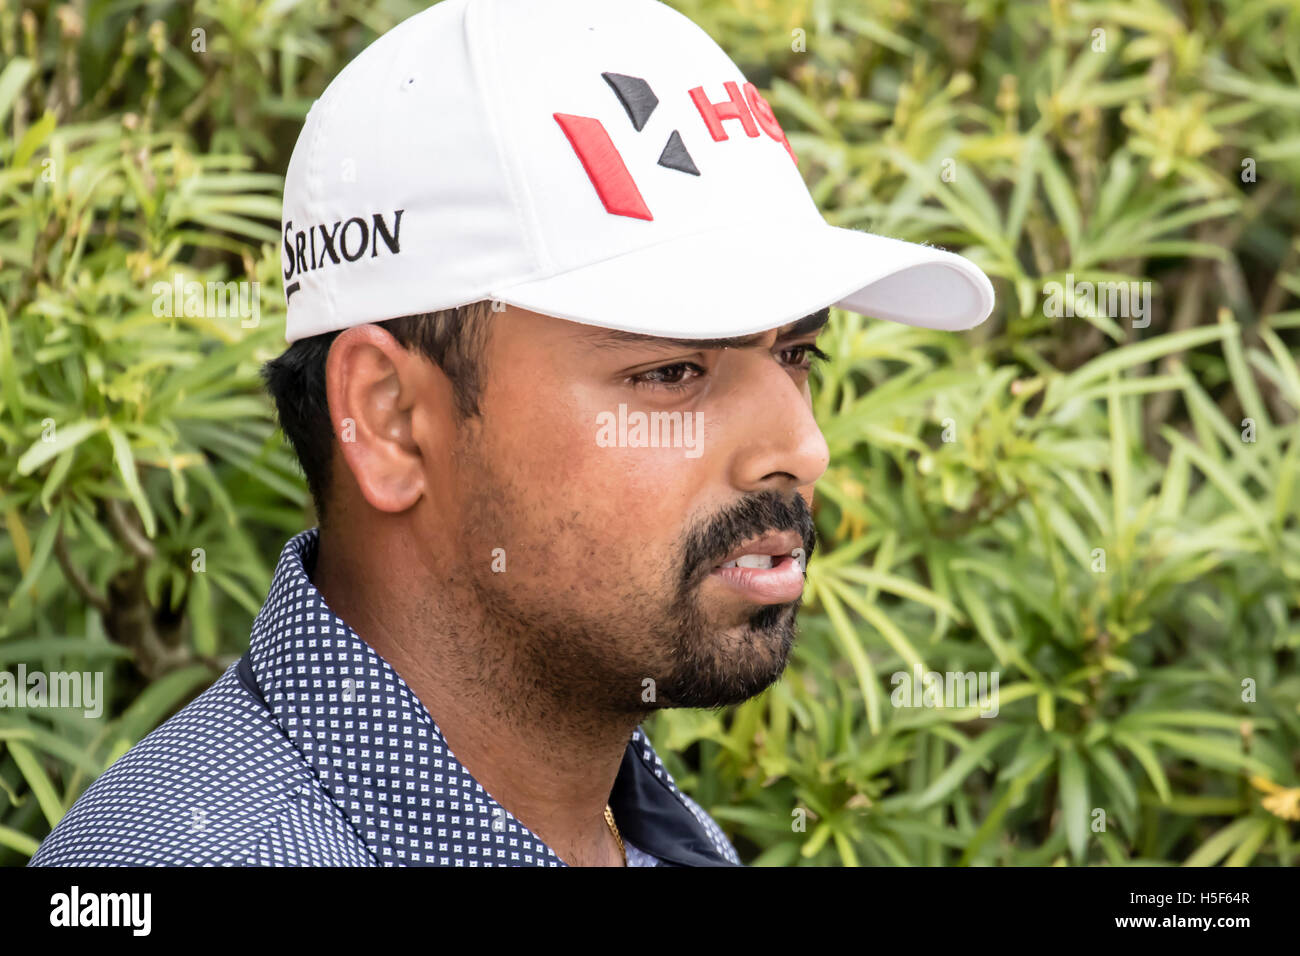 Kuala Lumpur, Malaysia. 20th Oct, 2016. Anirban Lahiri at the CIMB PGA 2016 Golf Championship at TPCKL golf course - Stock Image